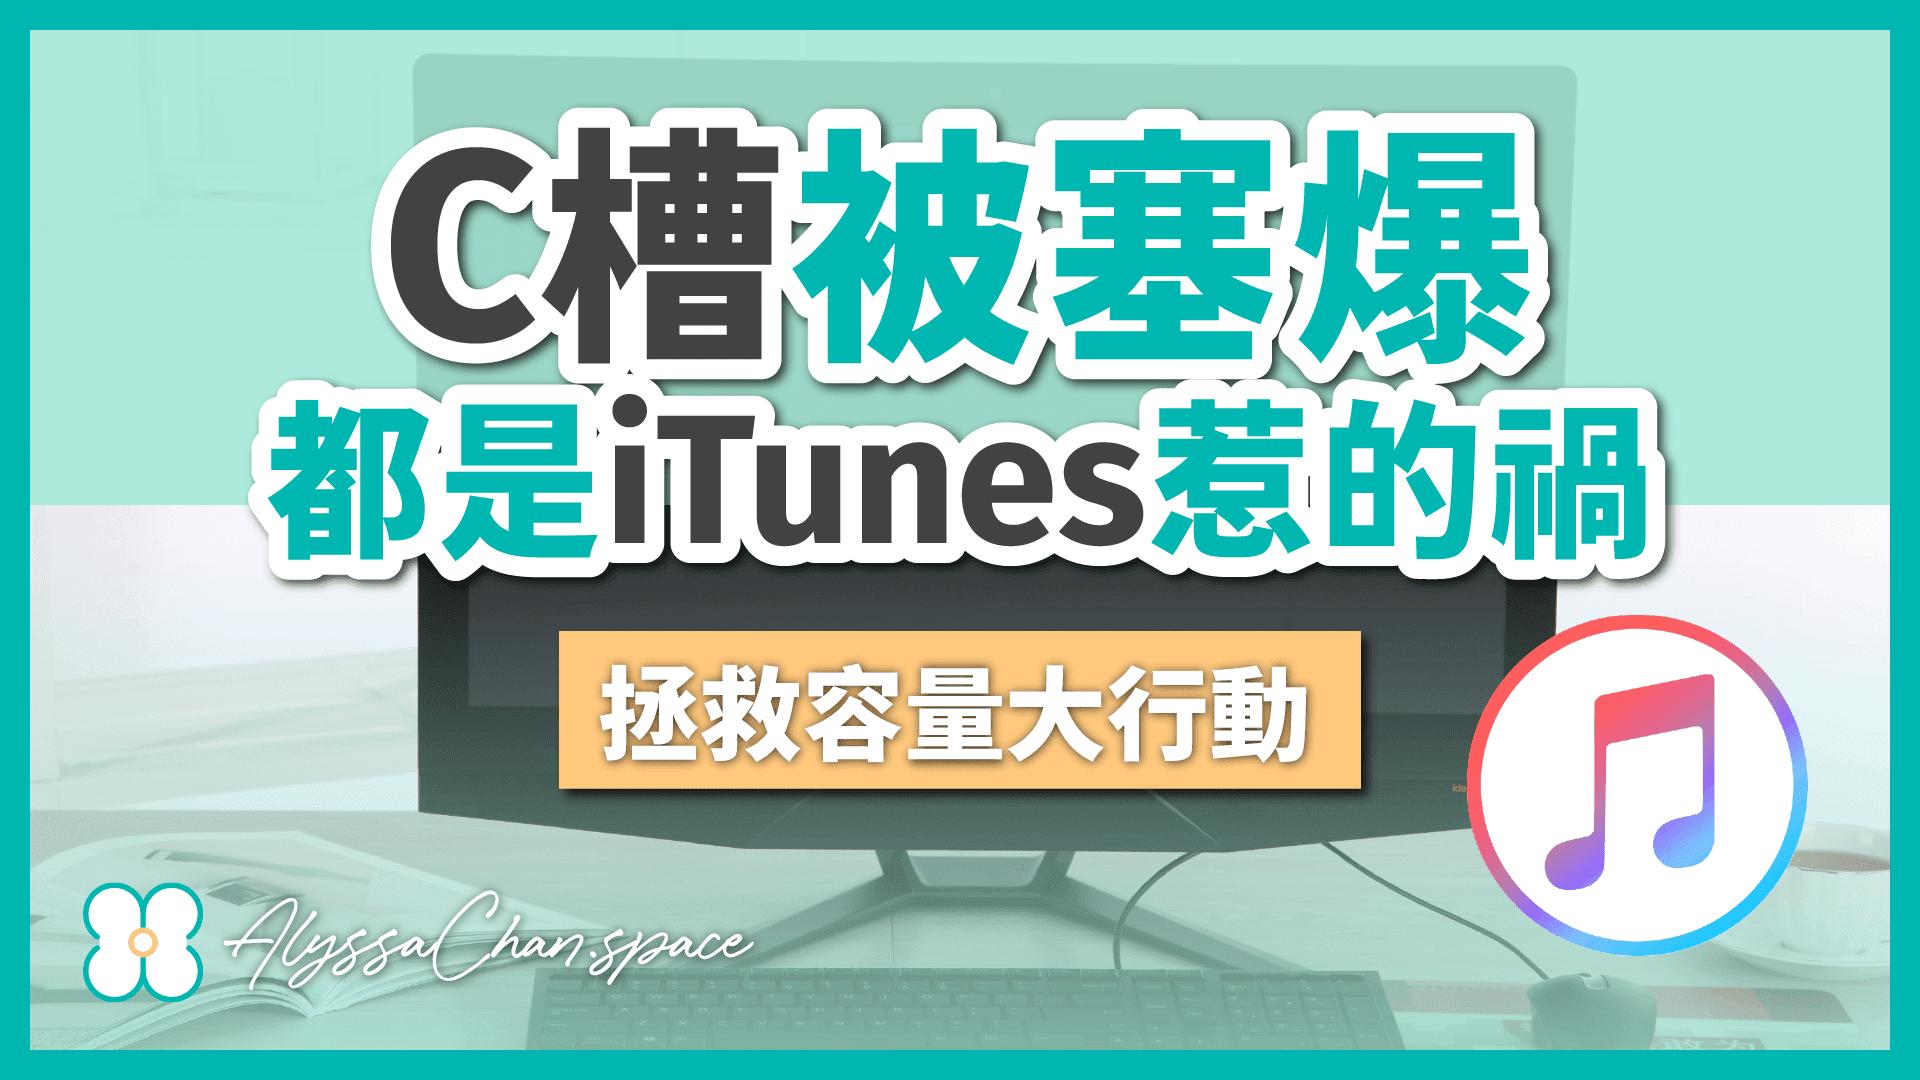 [Win] 釋放C Drive空間:更改iTunes備份位置